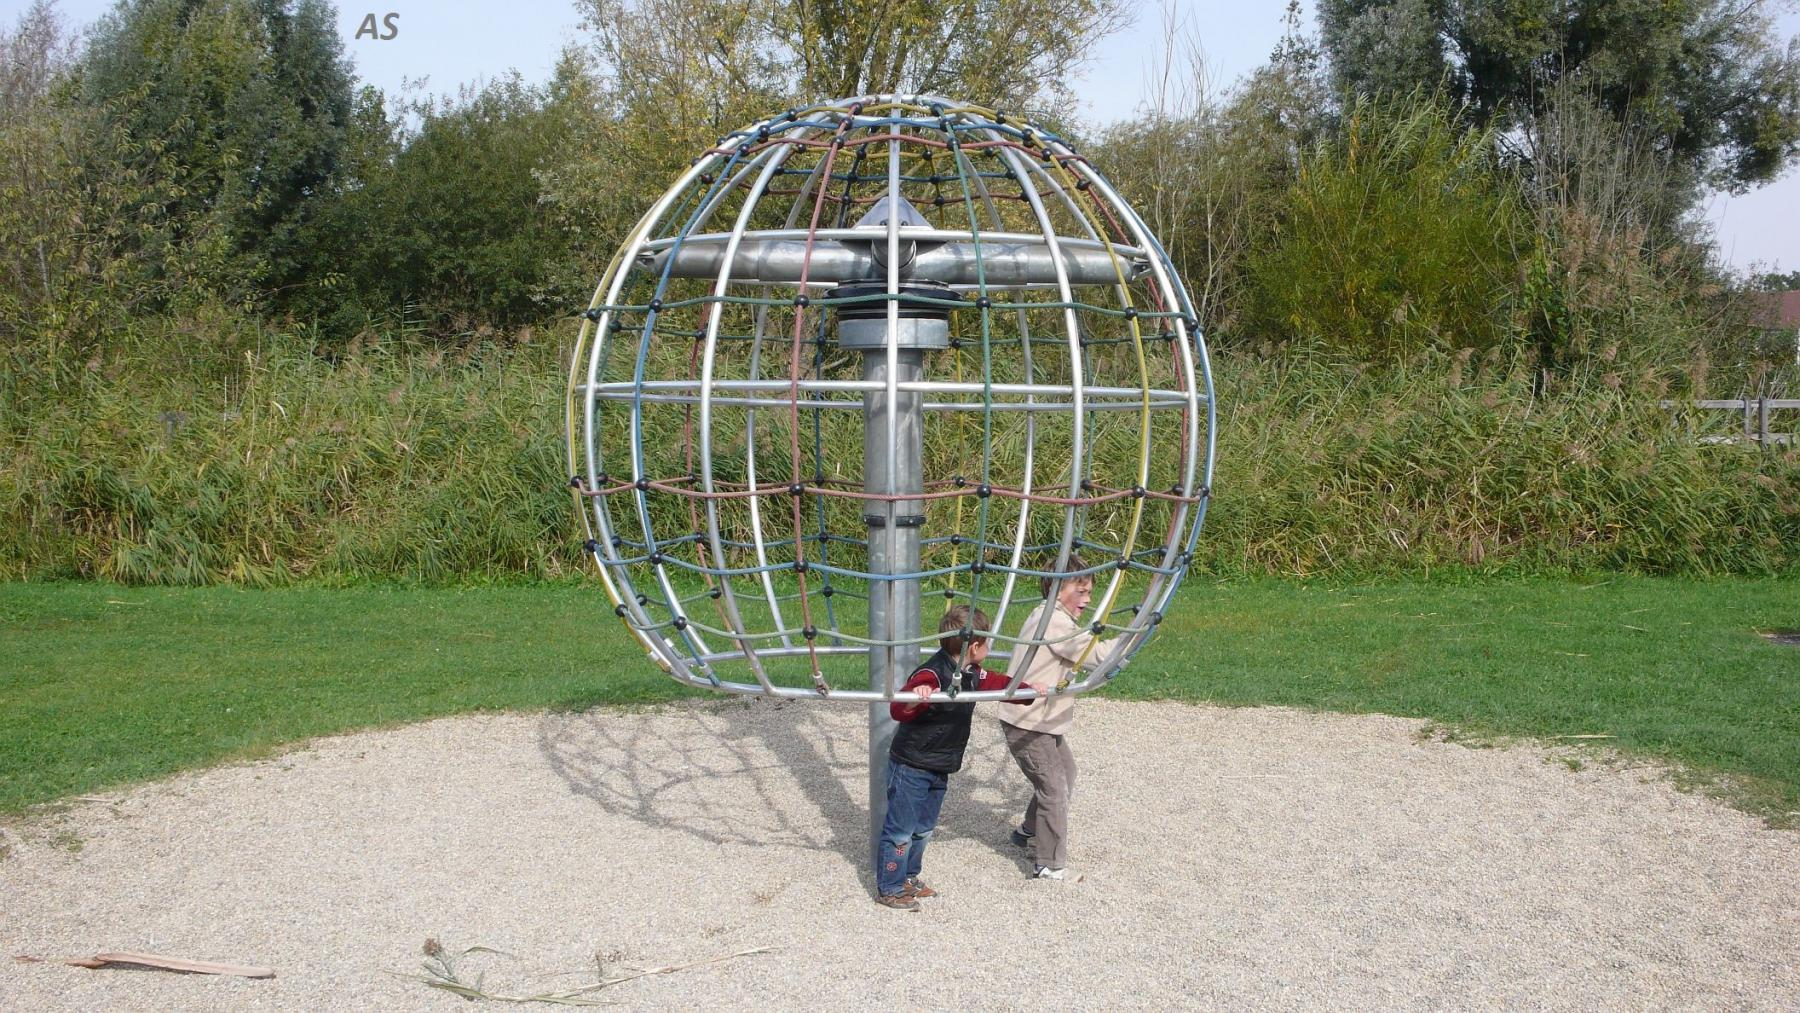 Hally-Gally Spogg Spielplatzgeräte Skylab Karussell Klettergerüst ...